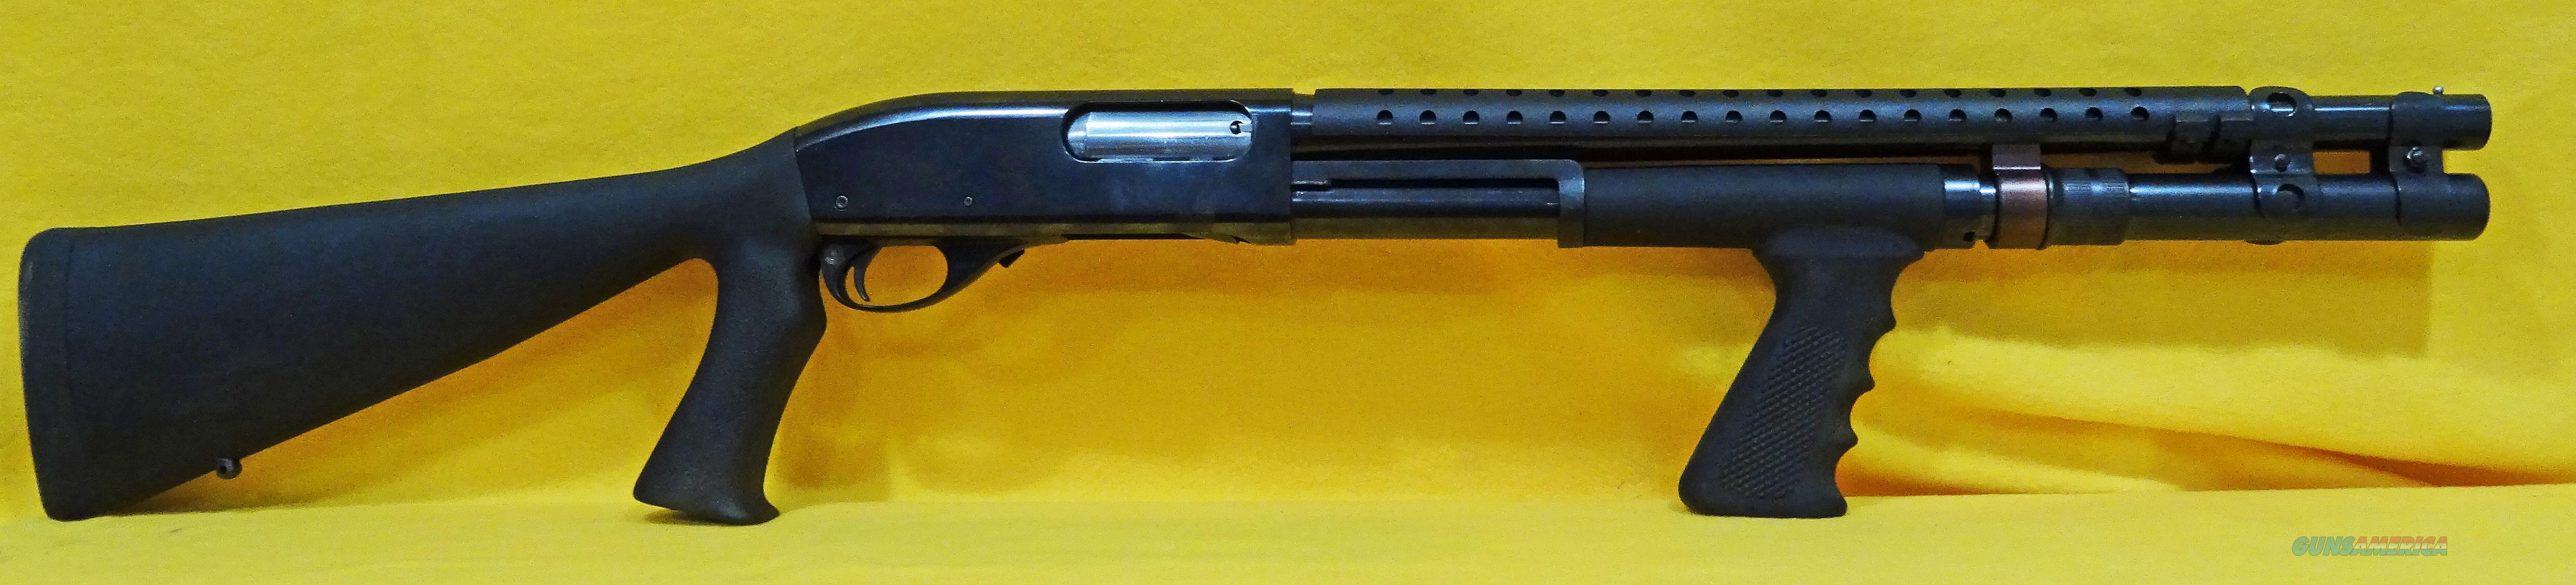 REMINGTON 870  Guns > Shotguns > Remington Shotguns  > Pump > Tactical